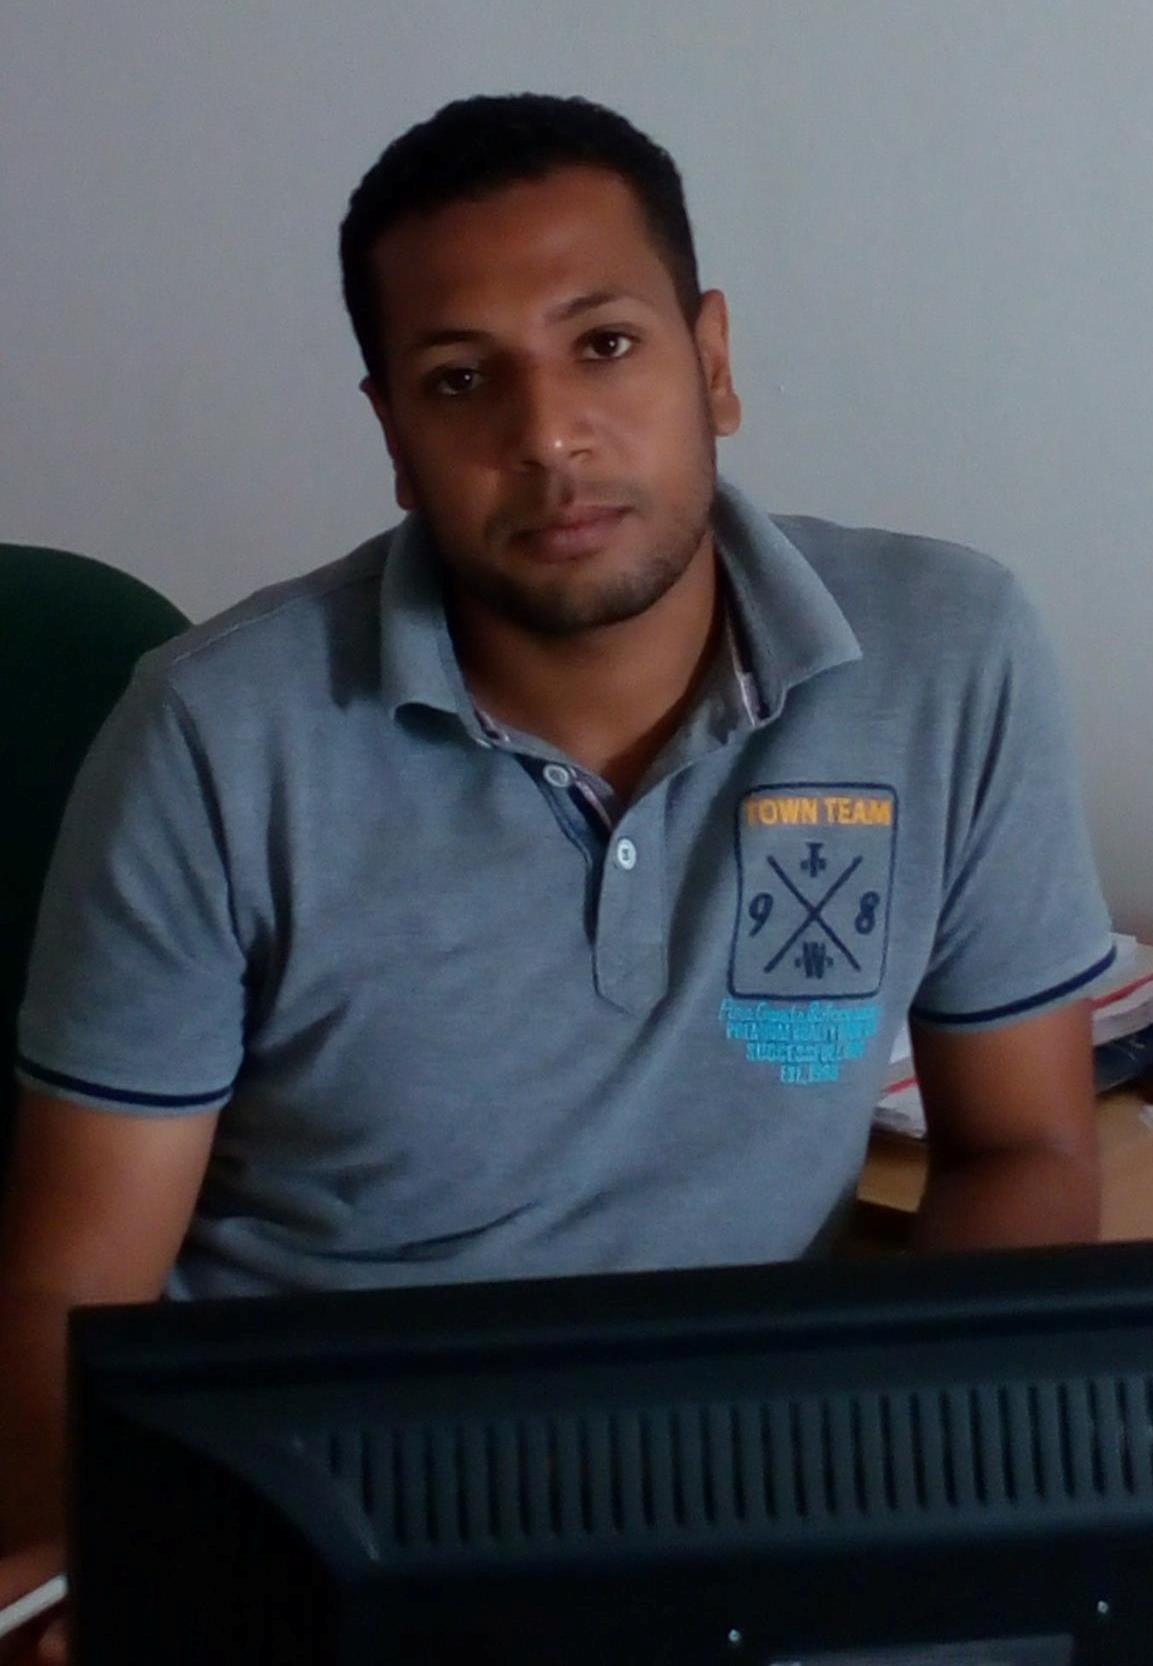 Adel Awad